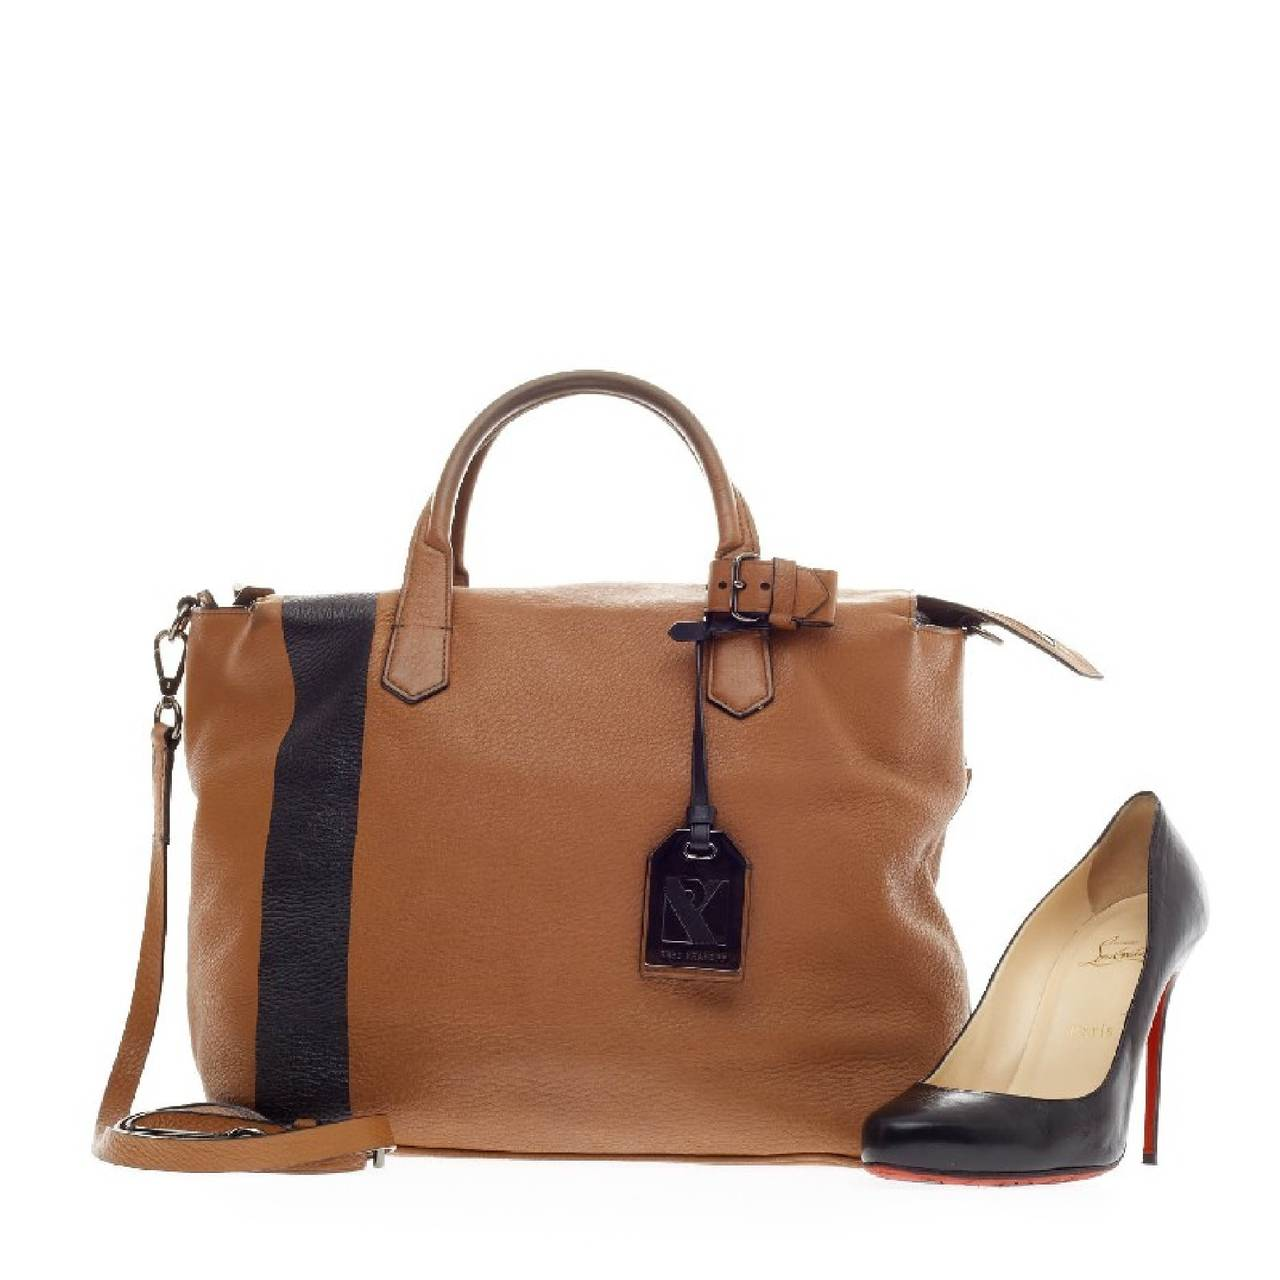 1stdibs 2000s Reed Krakoff Leather Bag rELEhME